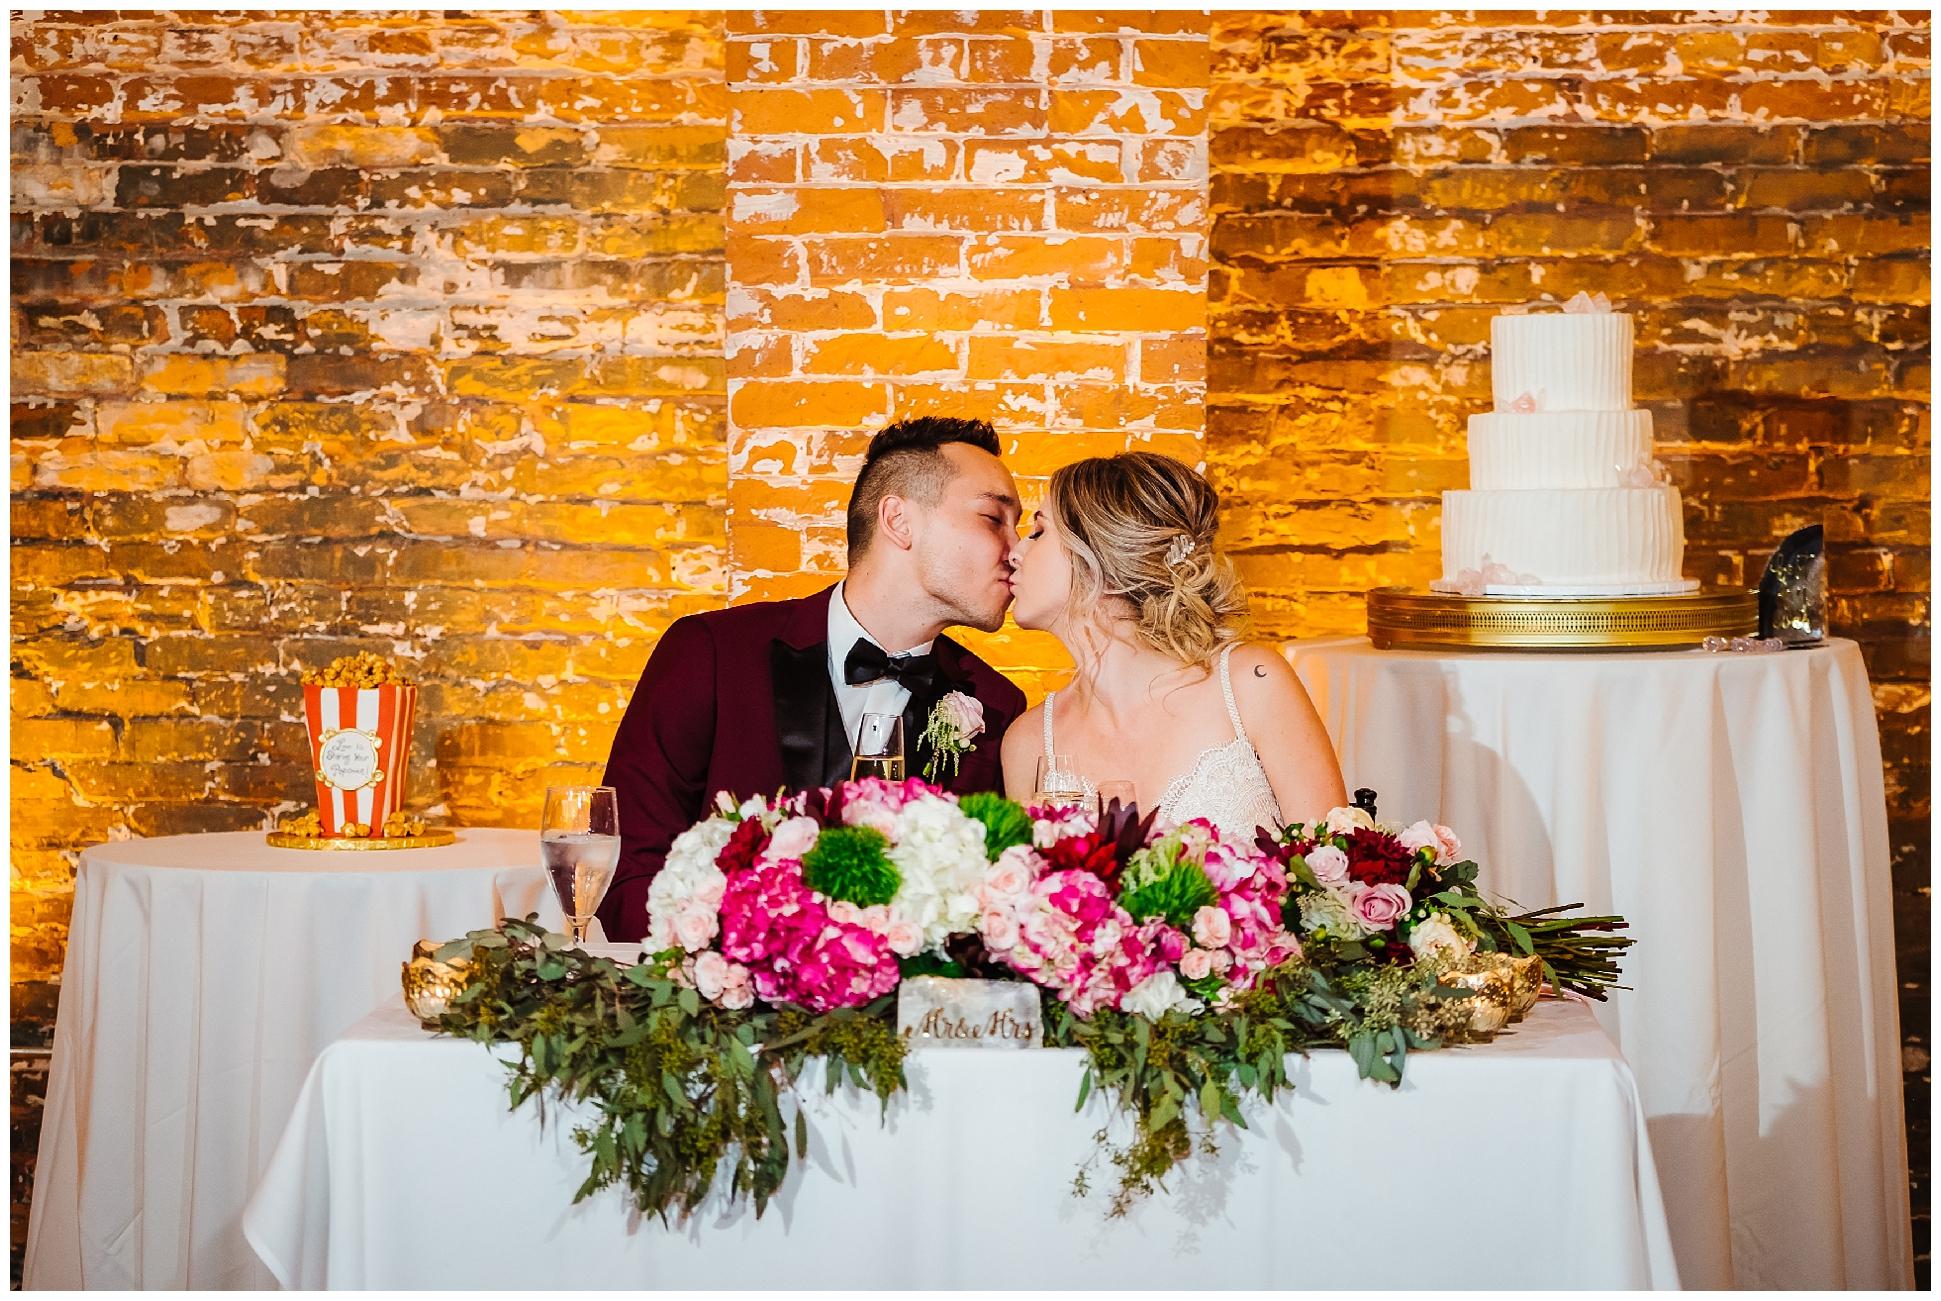 tampa-armeture-wedding-photographer-edgy-industrial-downtown-fancy-free-nursery-tattoo-burgandy-velvet_0078.jpg